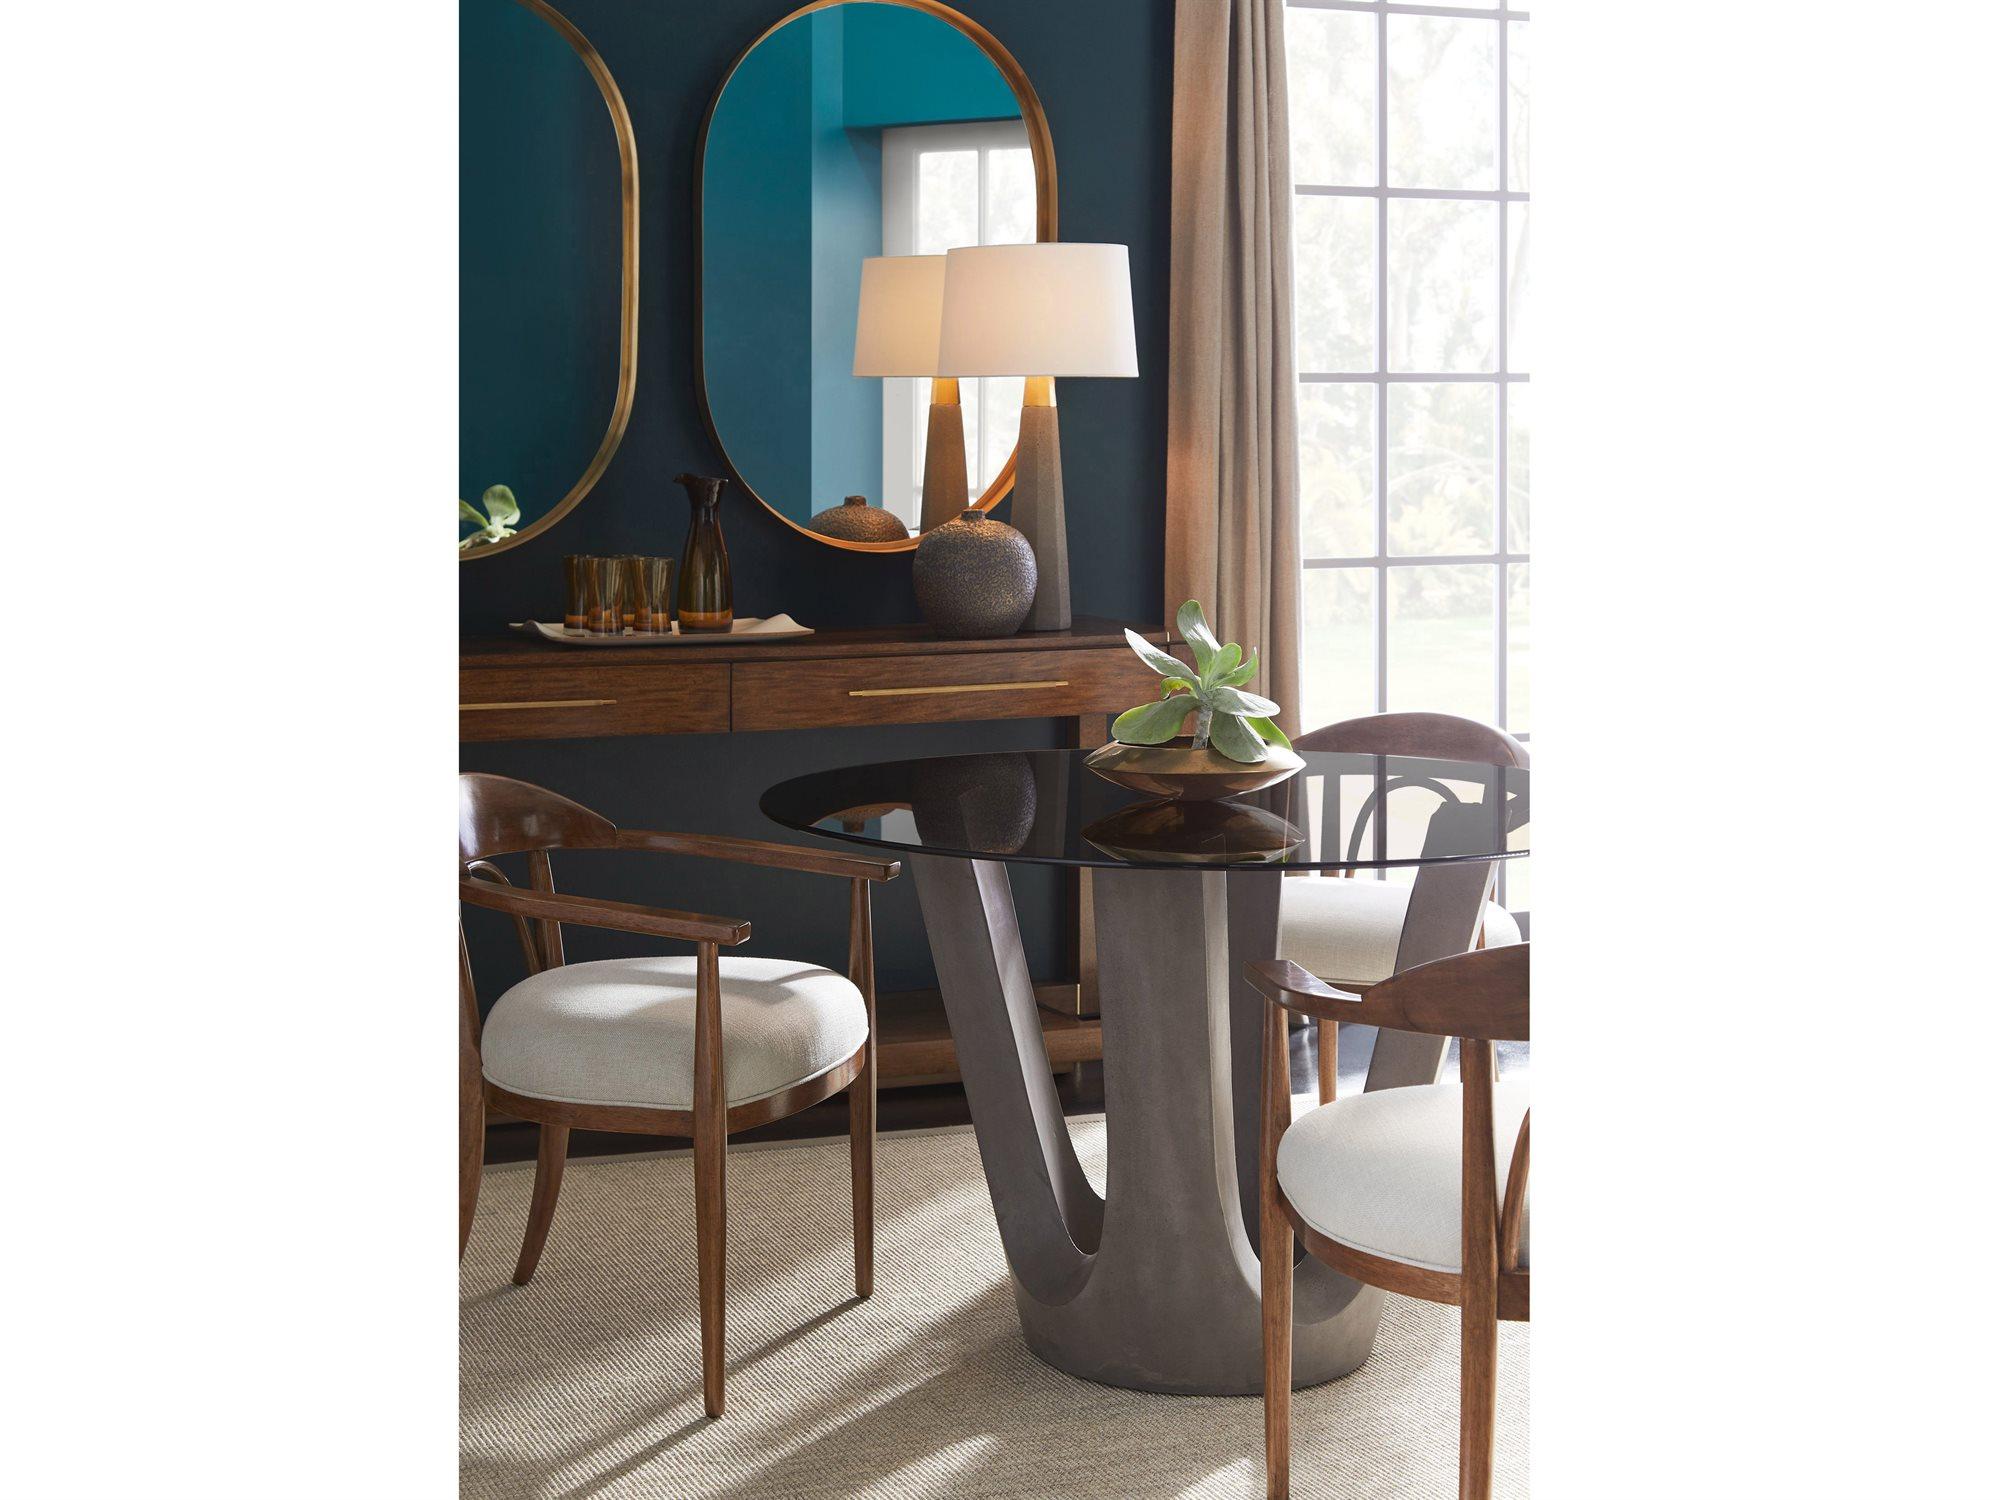 stanley furniture dining room set | Stanley Furniture Panavista Dining Room Set | SL7049132SET